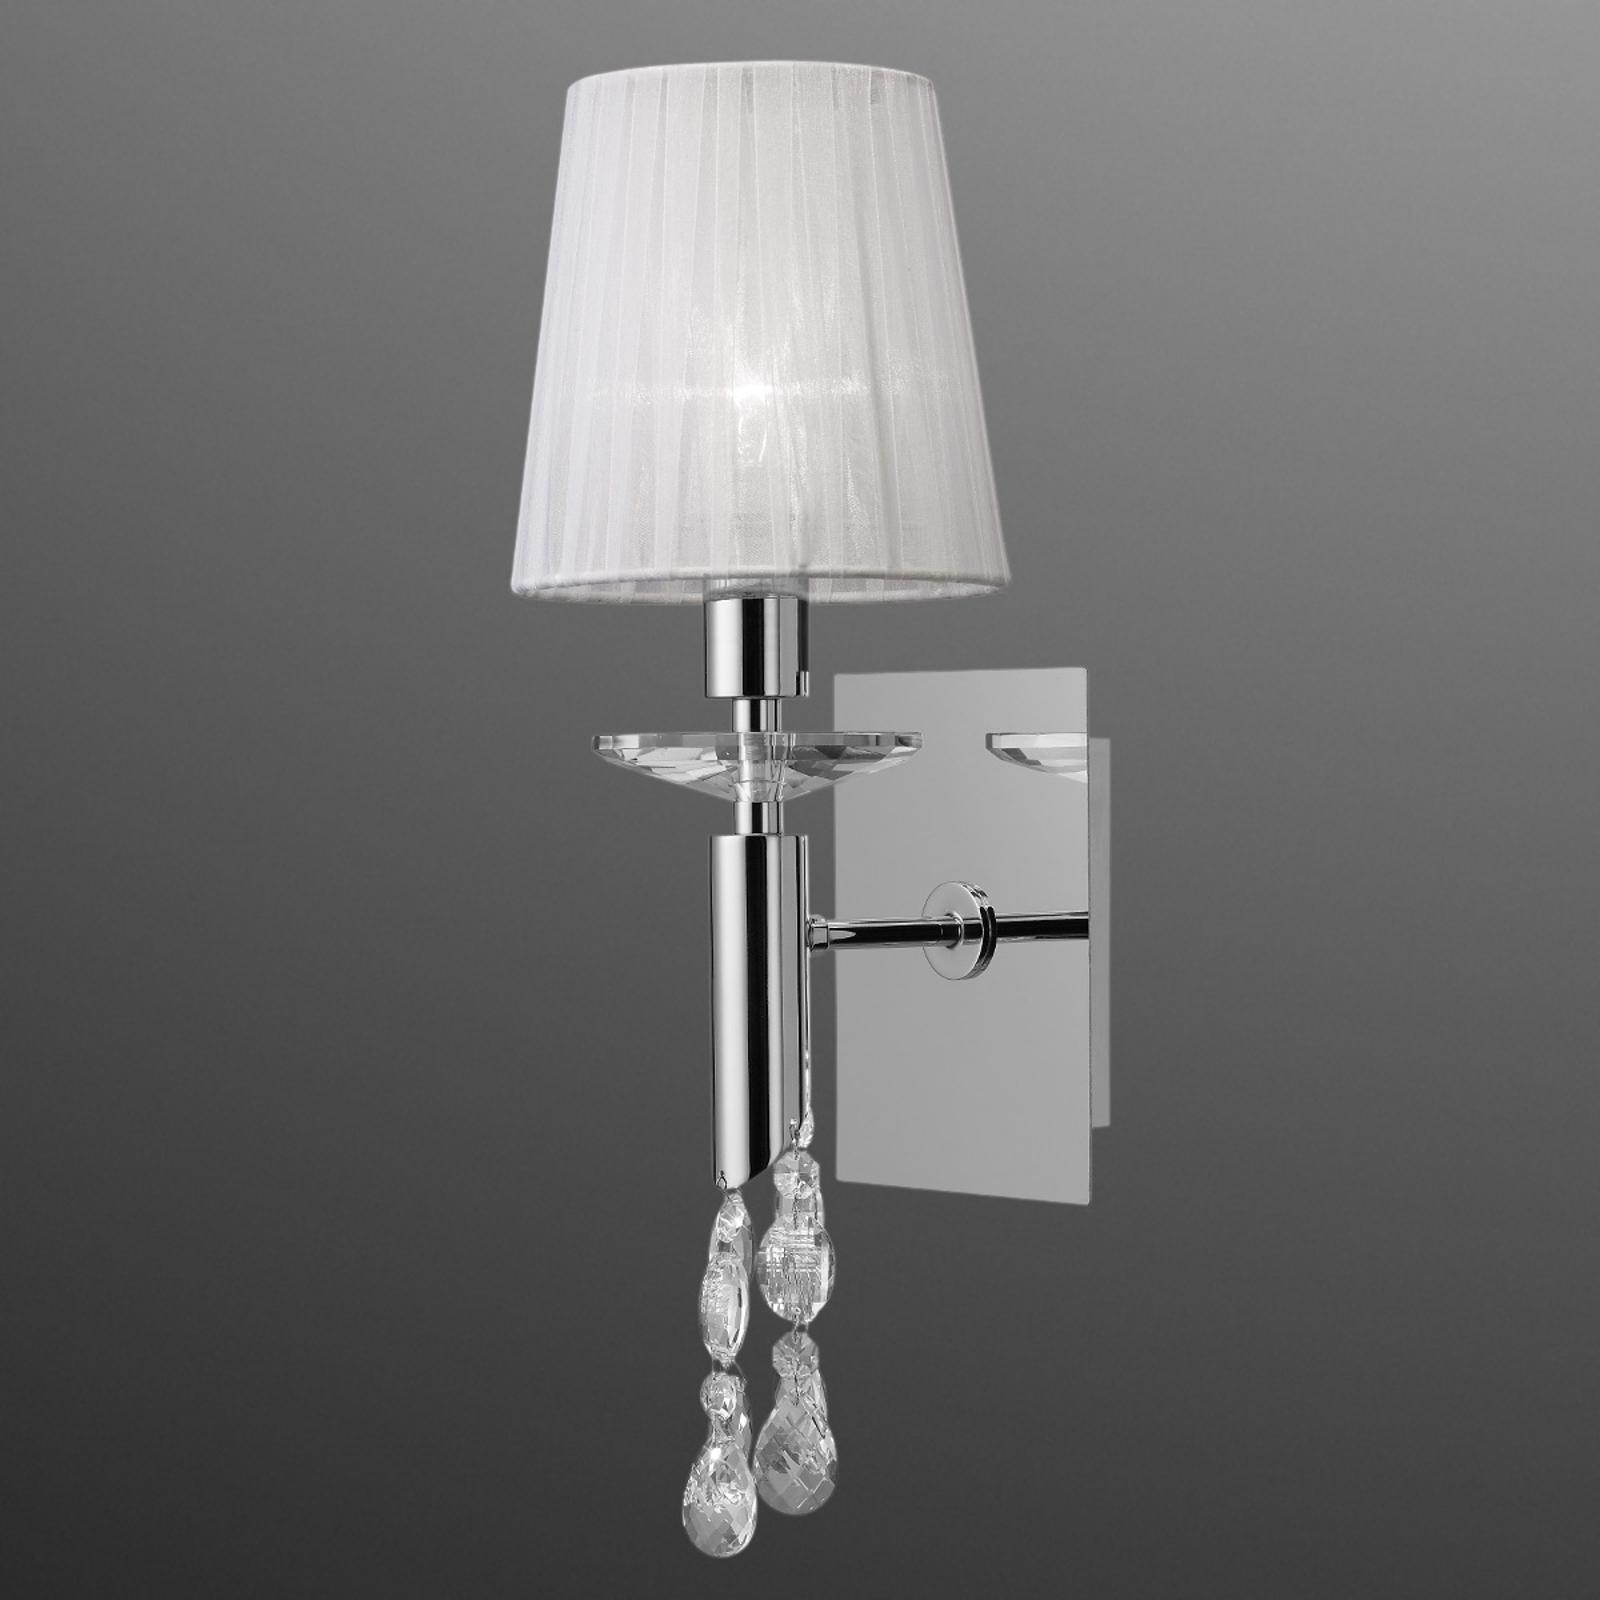 Wall light Lilja with a silk lampshade_6542287_1